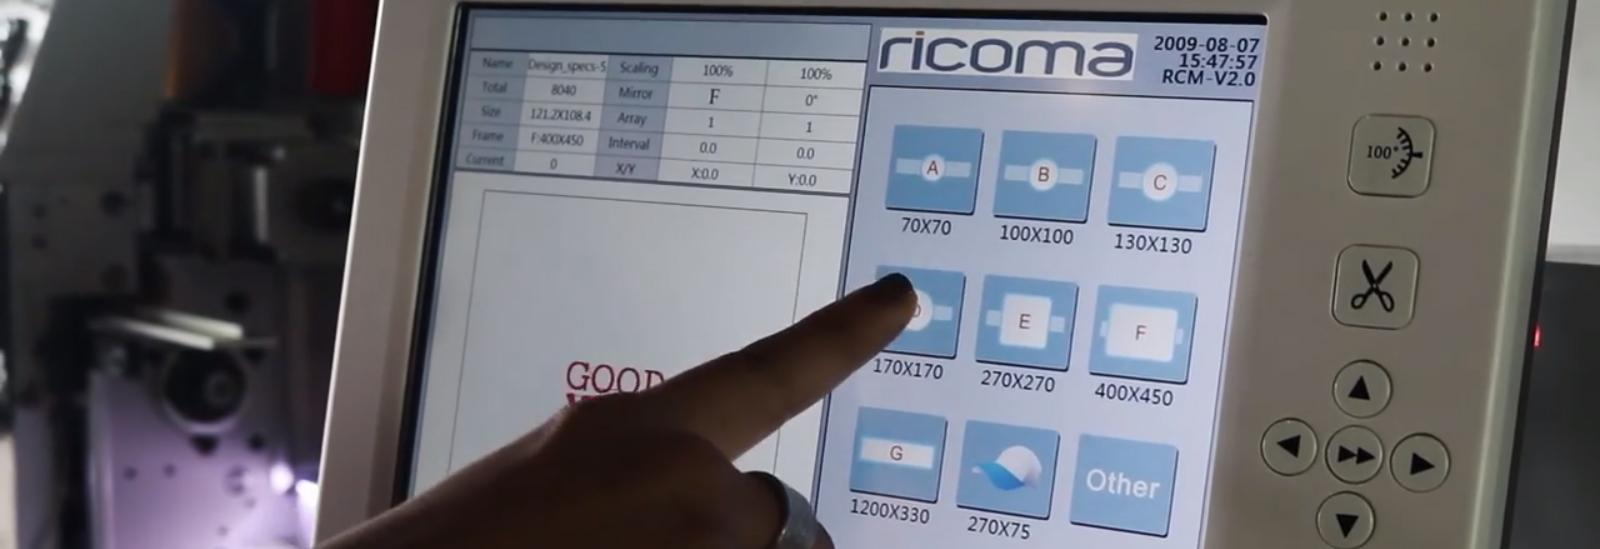 Ricoma CHT2-08